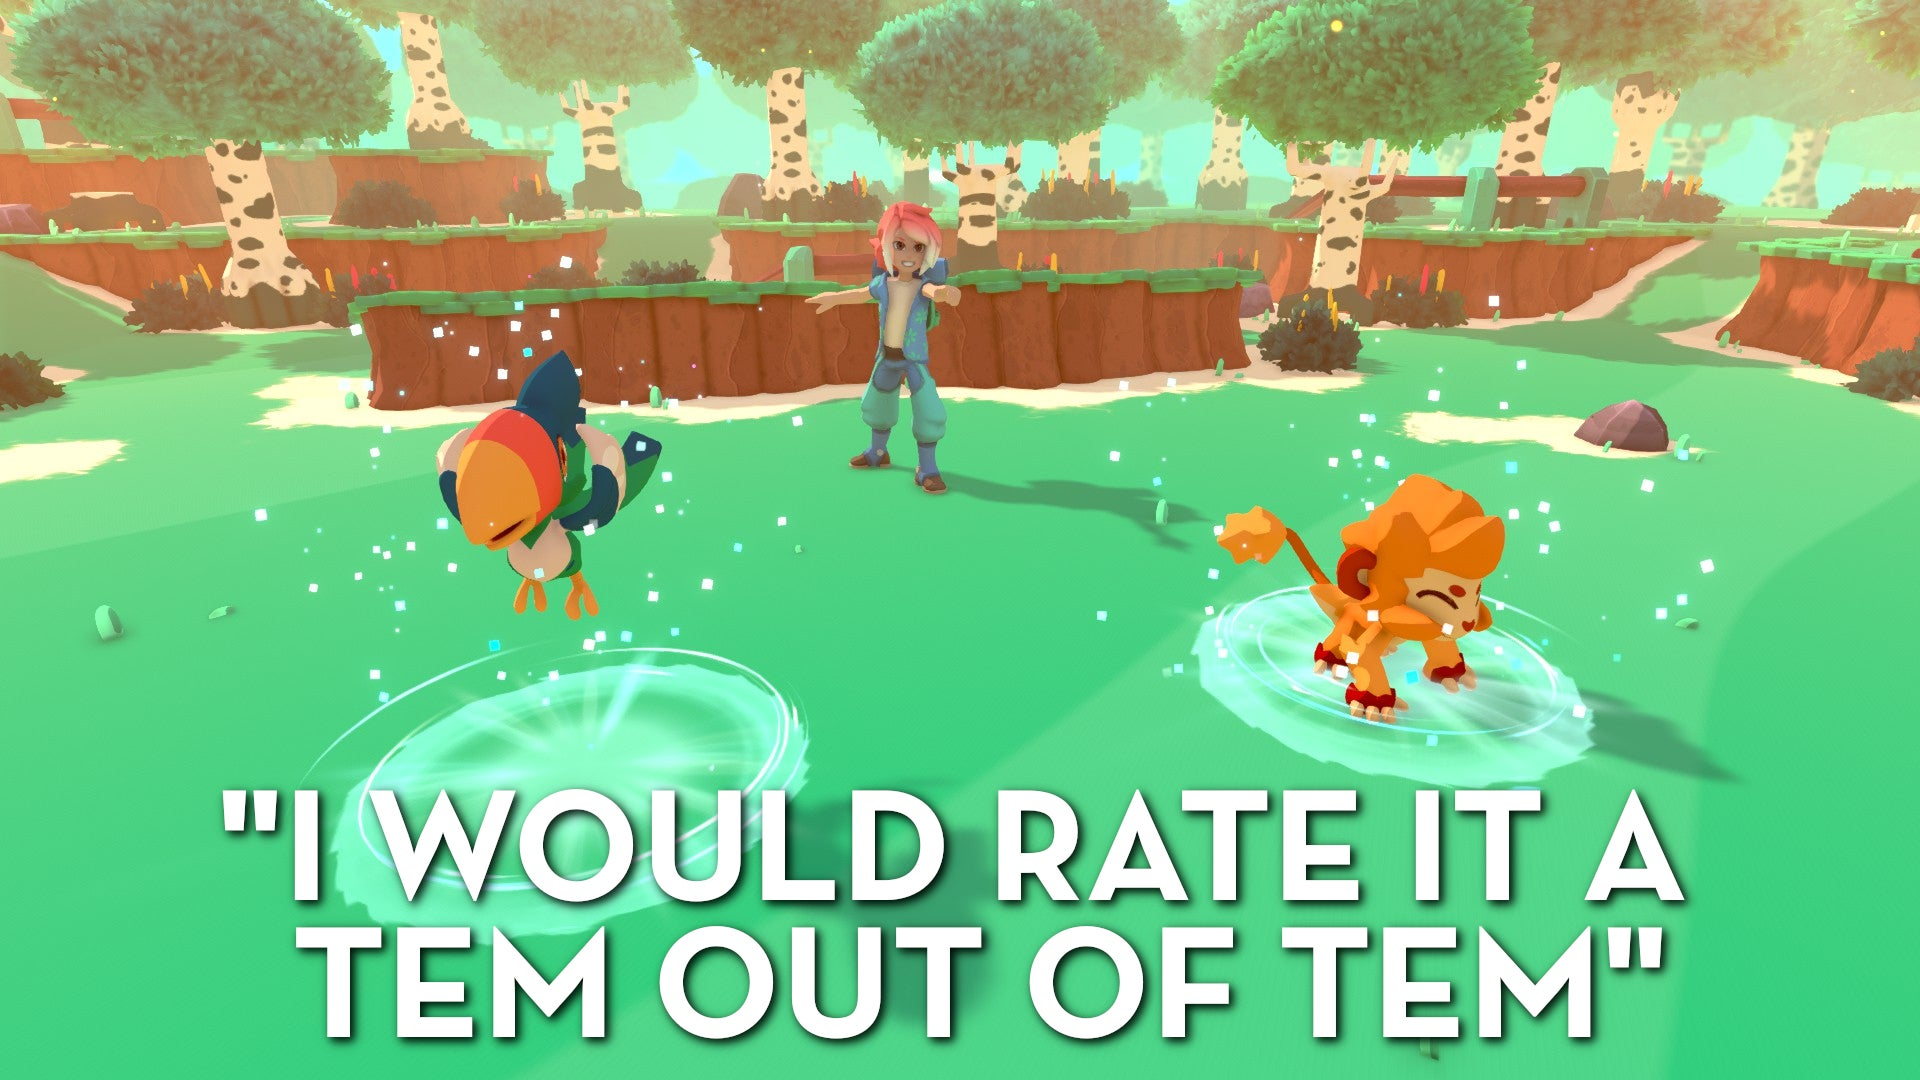 Temtem, As Told By Steam Reviews